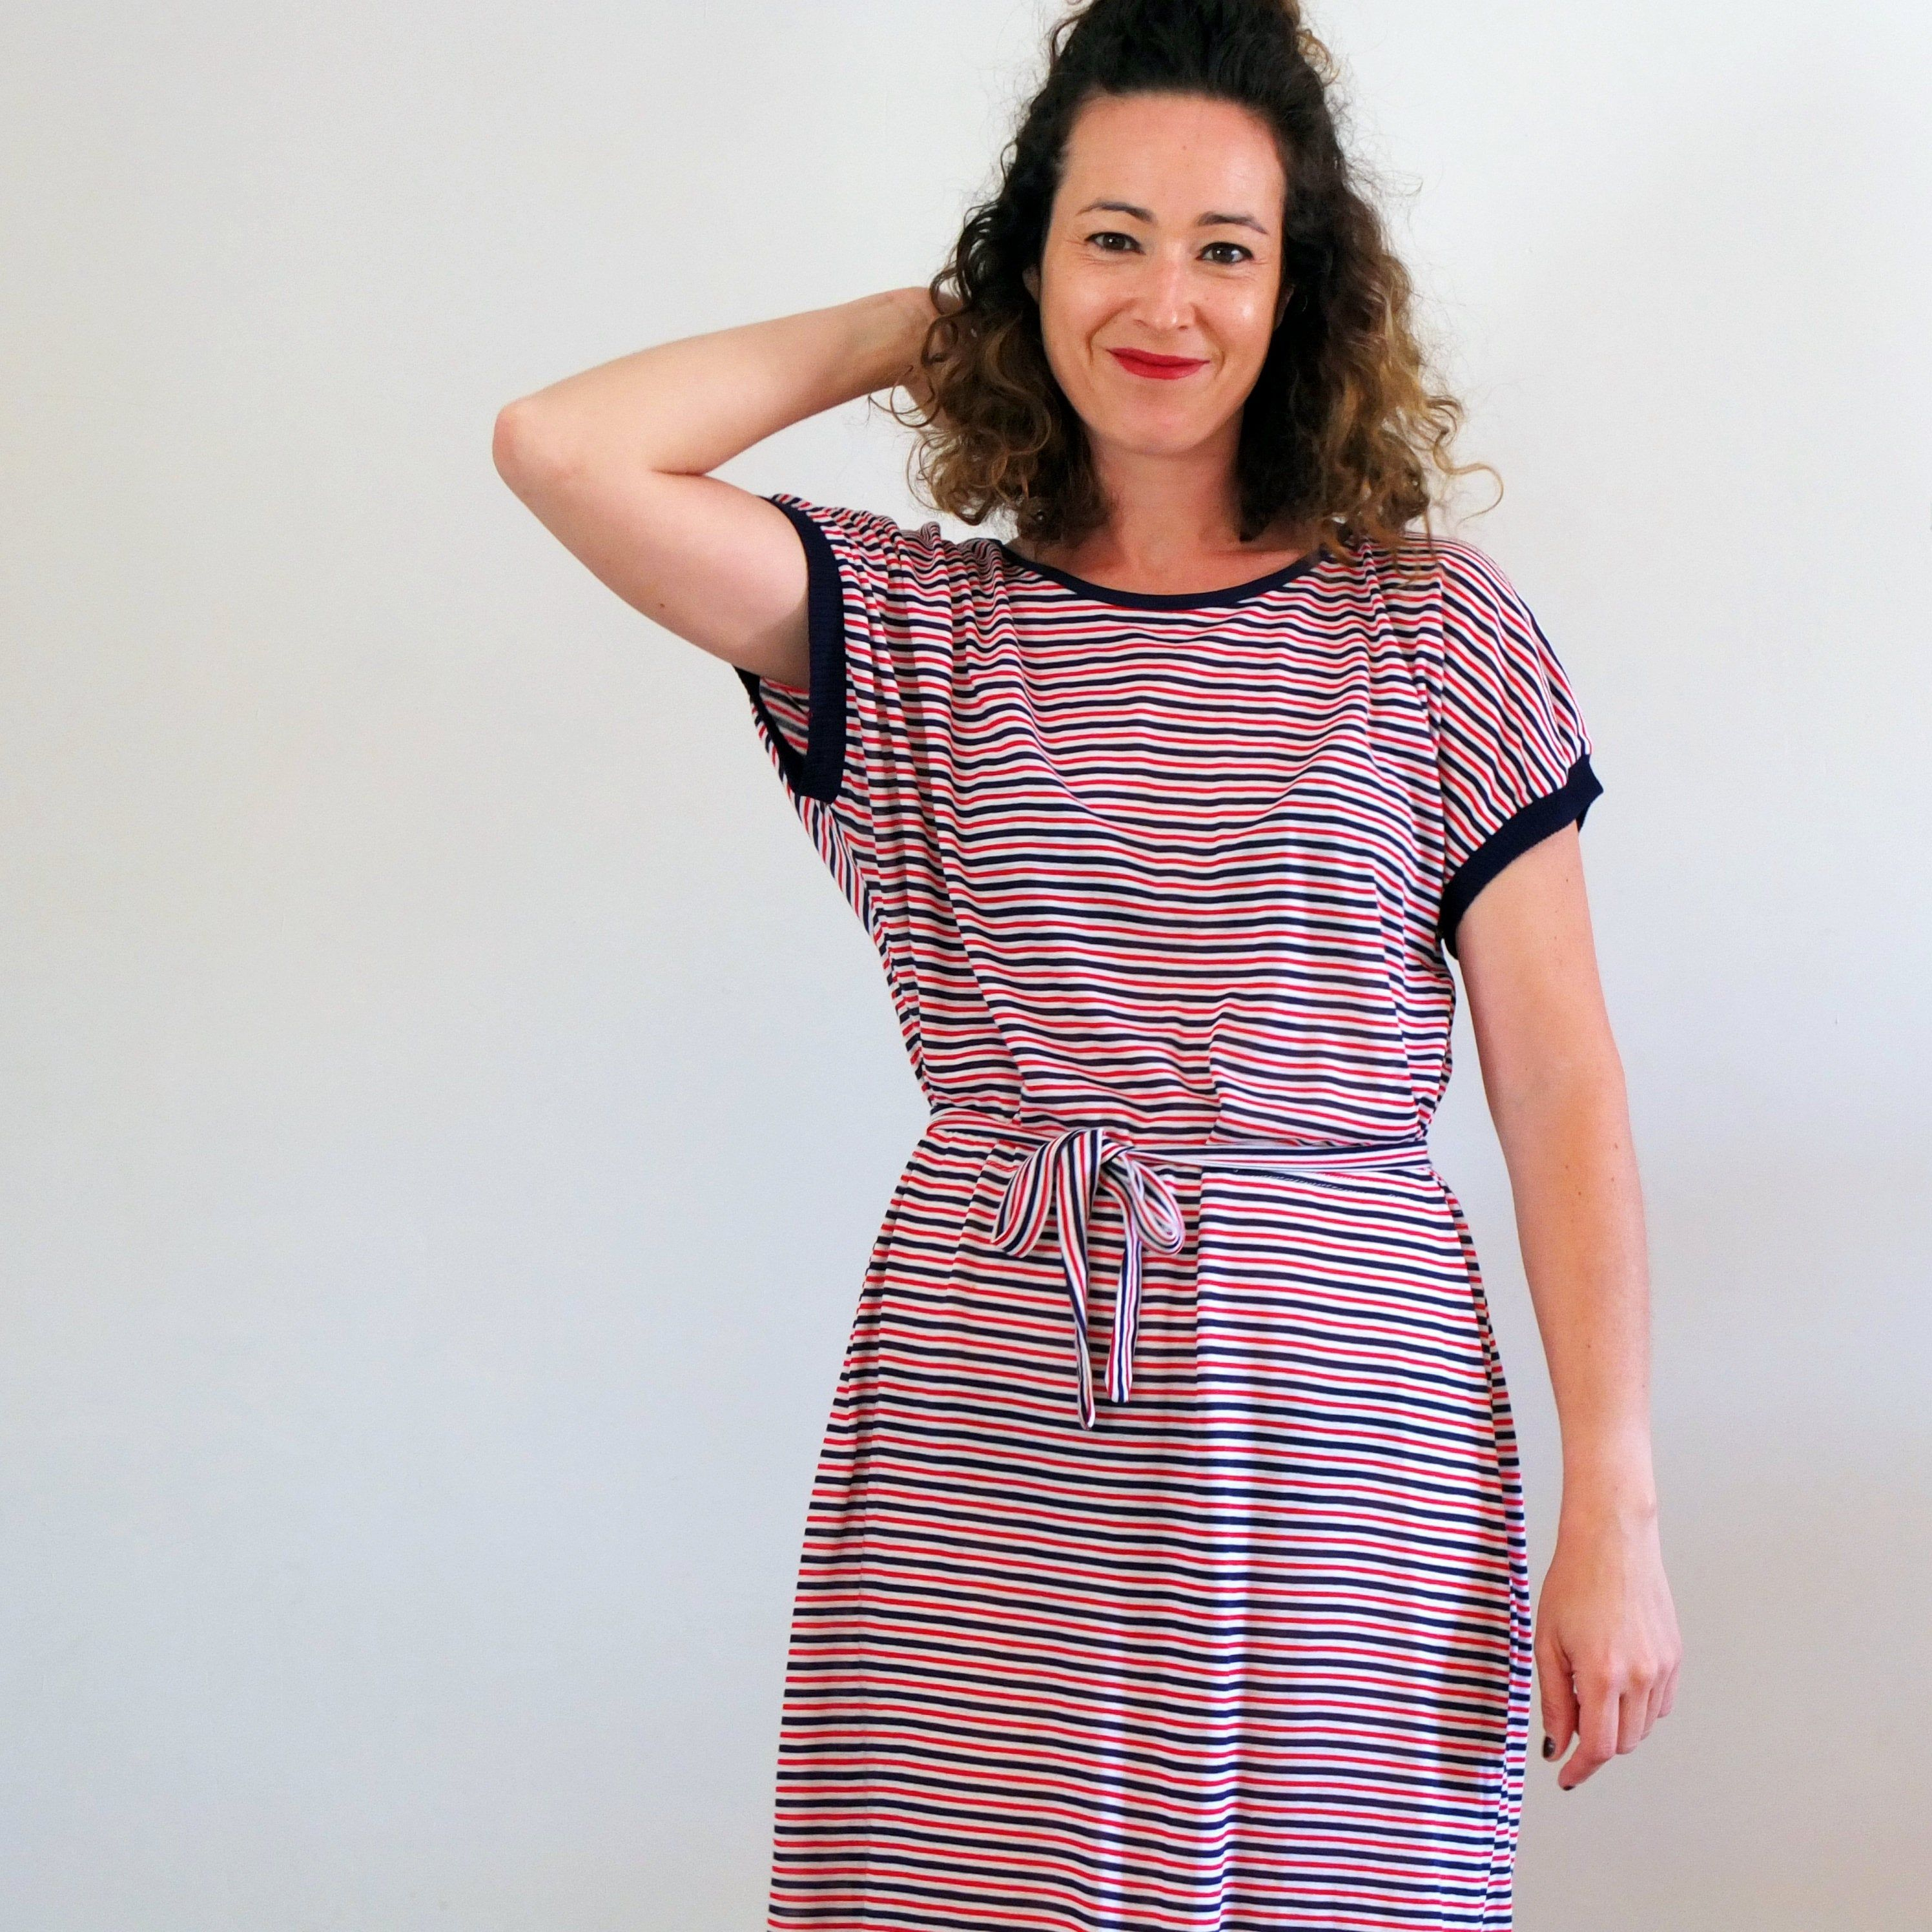 Vintage 80s Summer Striped Dress Loose Day Knit Dress 80s Etsy Striped Dress Summer Knit Midi Dress Striped Sweater Dress [ 2992 x 2992 Pixel ]